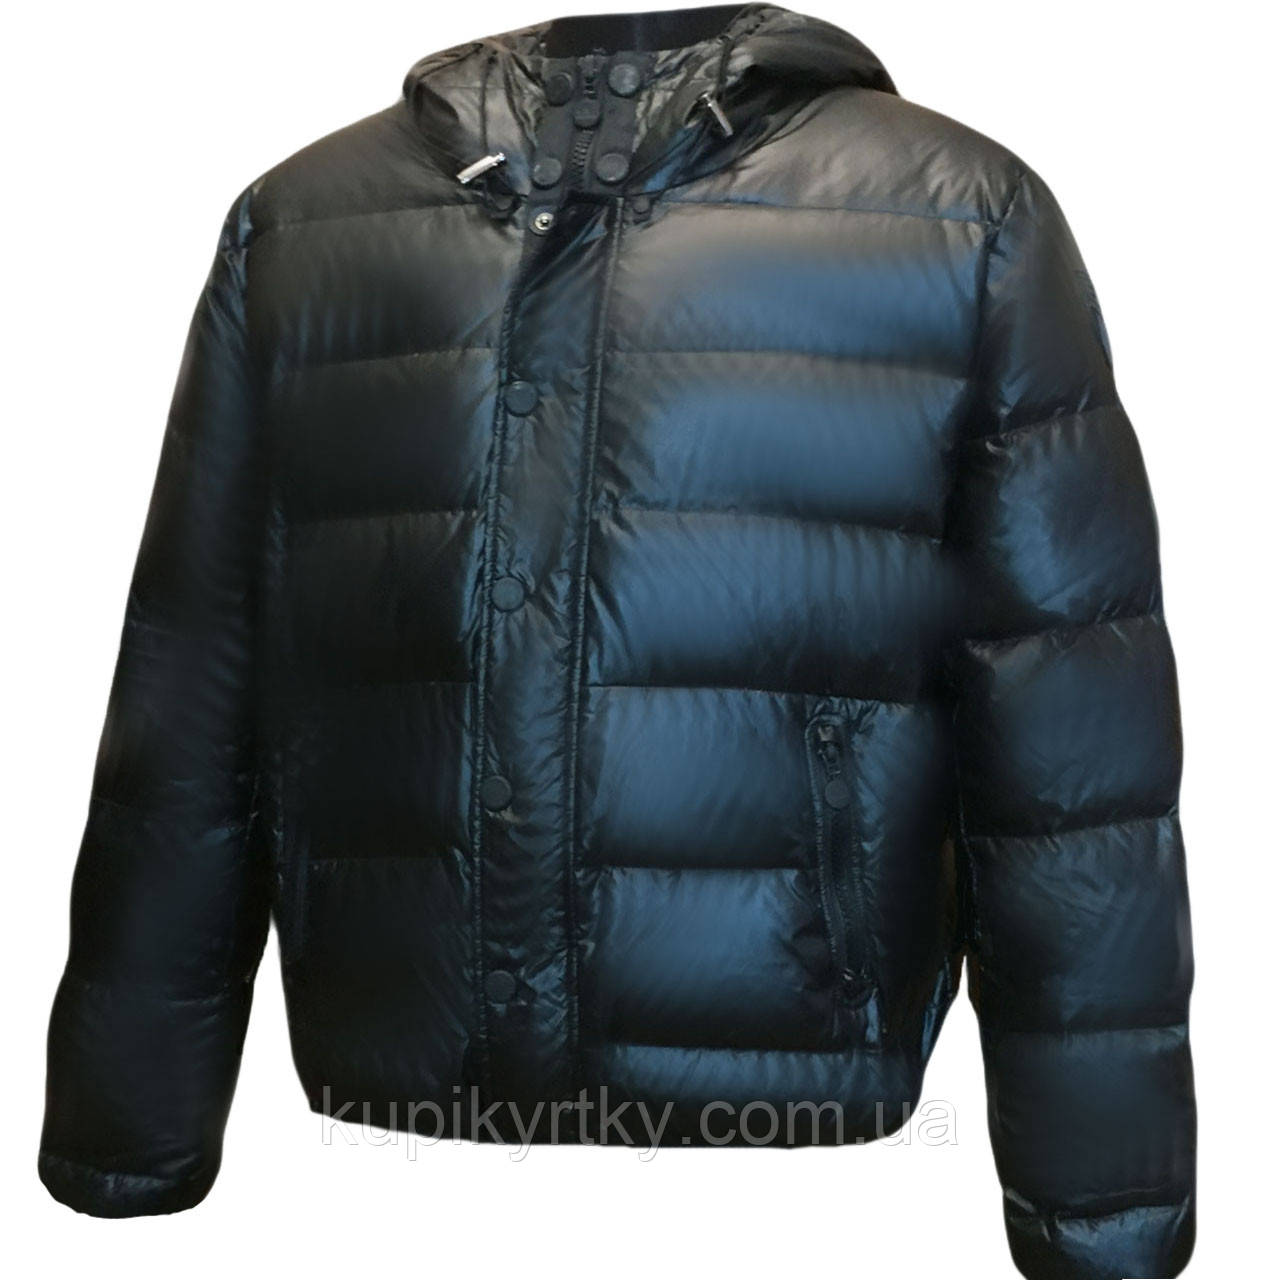 Куртка мужская зимняя на пуху  ARMANI (италия)